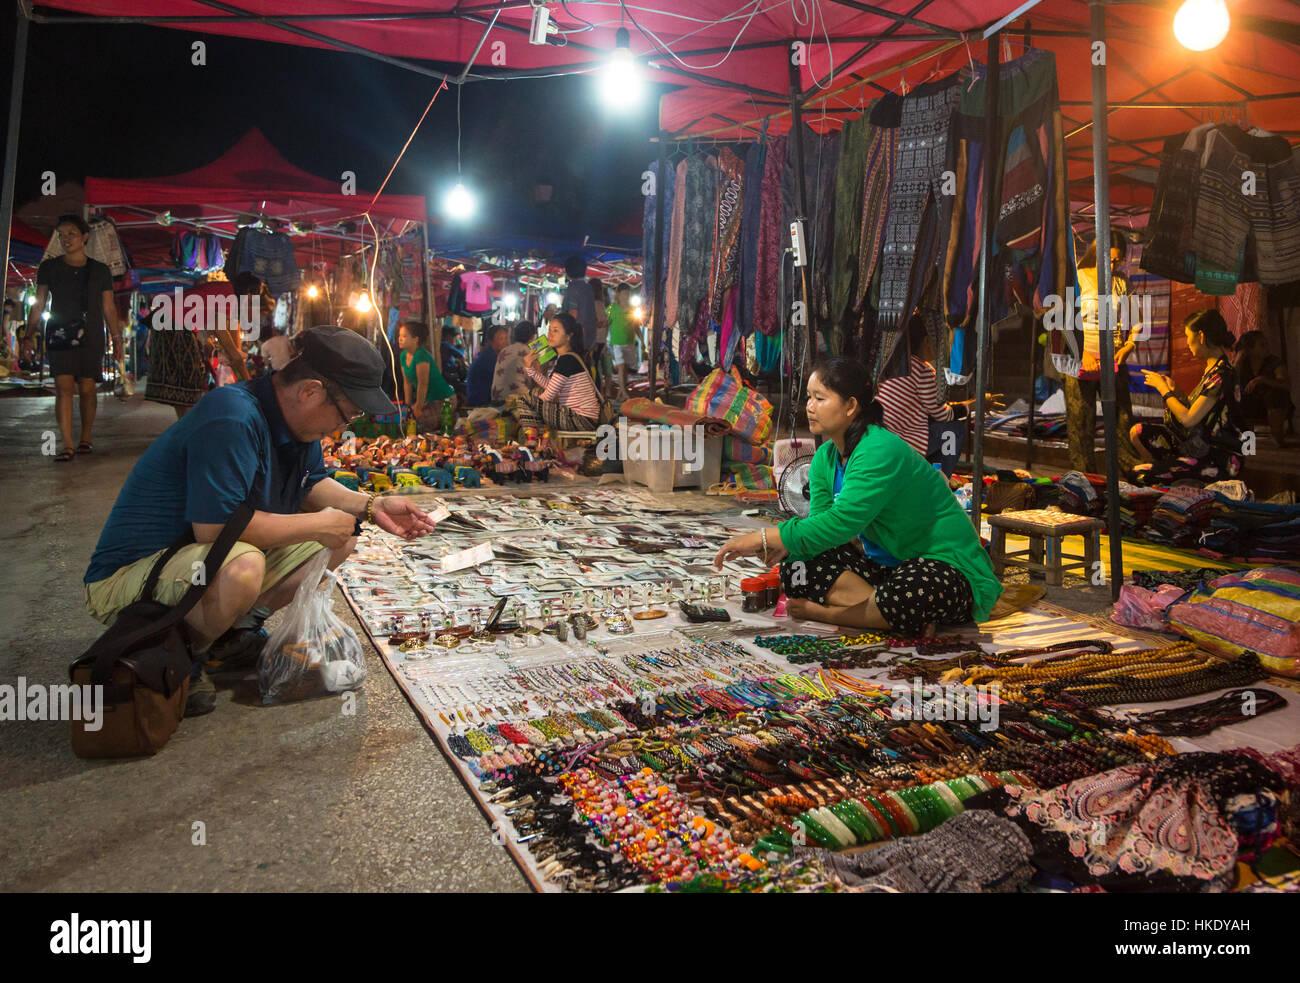 LUANG PRABANG, LAOS - 15. Mai 2015: Ein Tourist sucht nach Souvenir in Luang Prabang Nachtmarkt, einem erstklassigen Stockbild